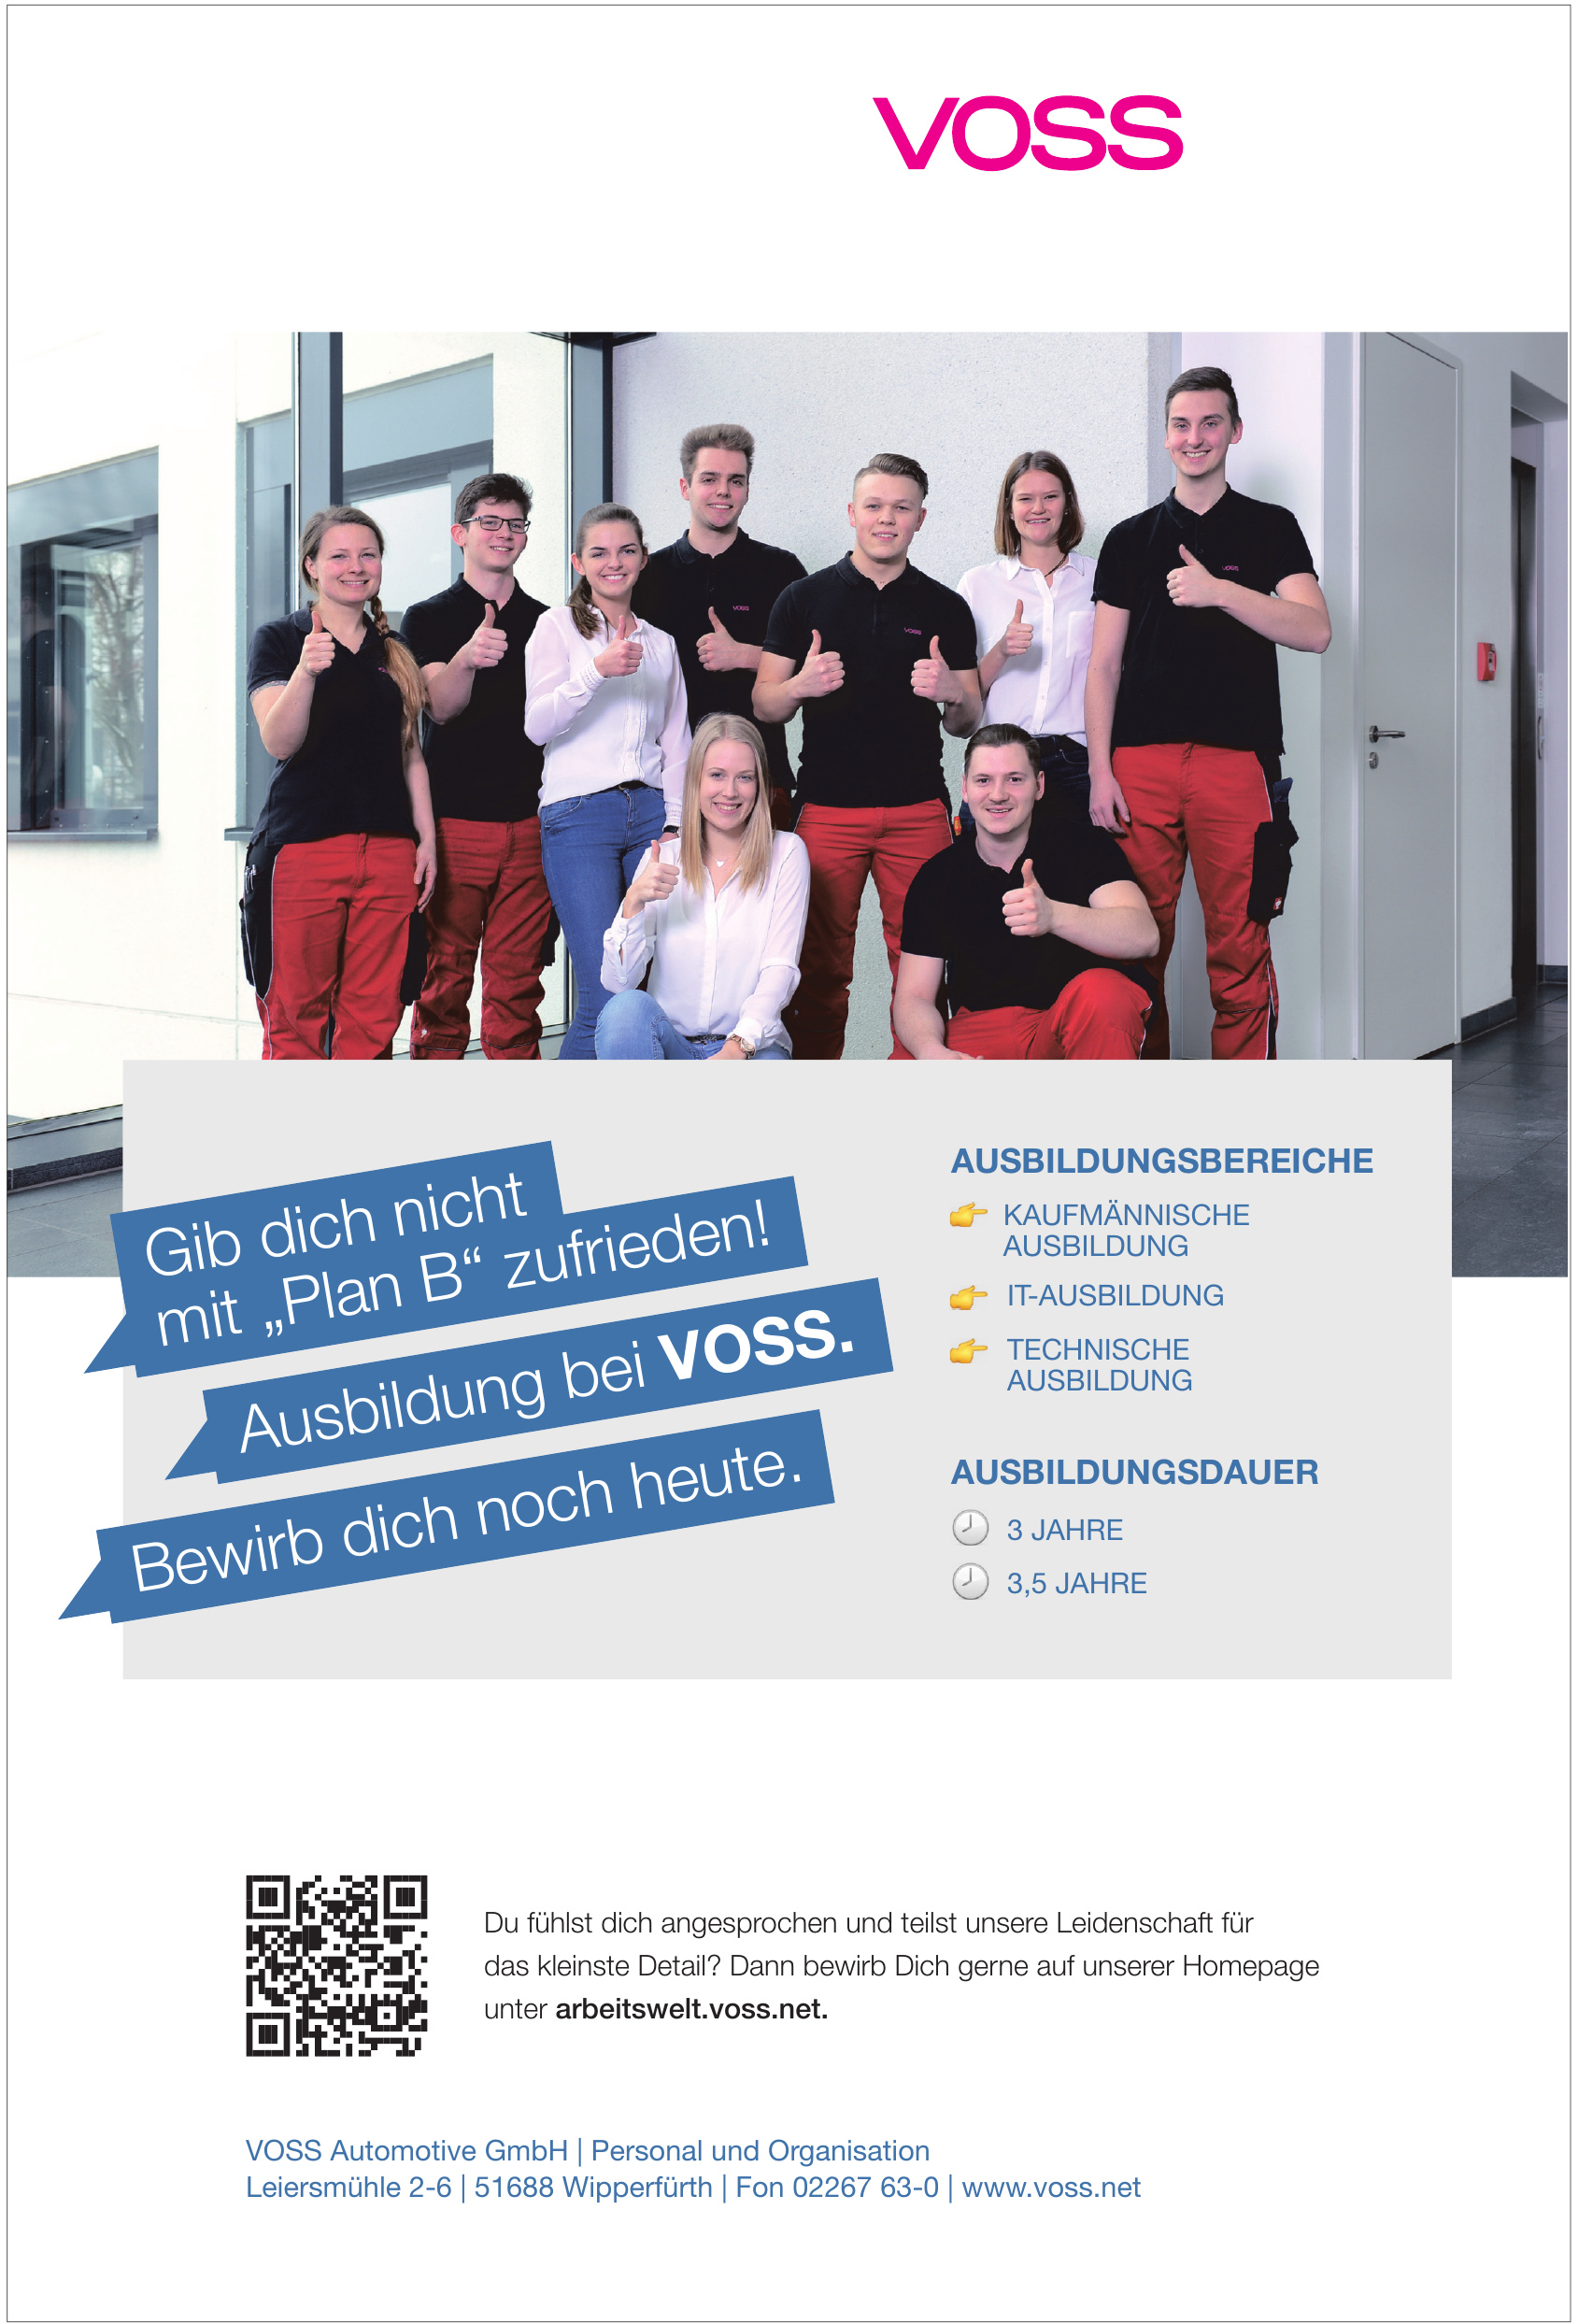 VOSS Automotive GmbH